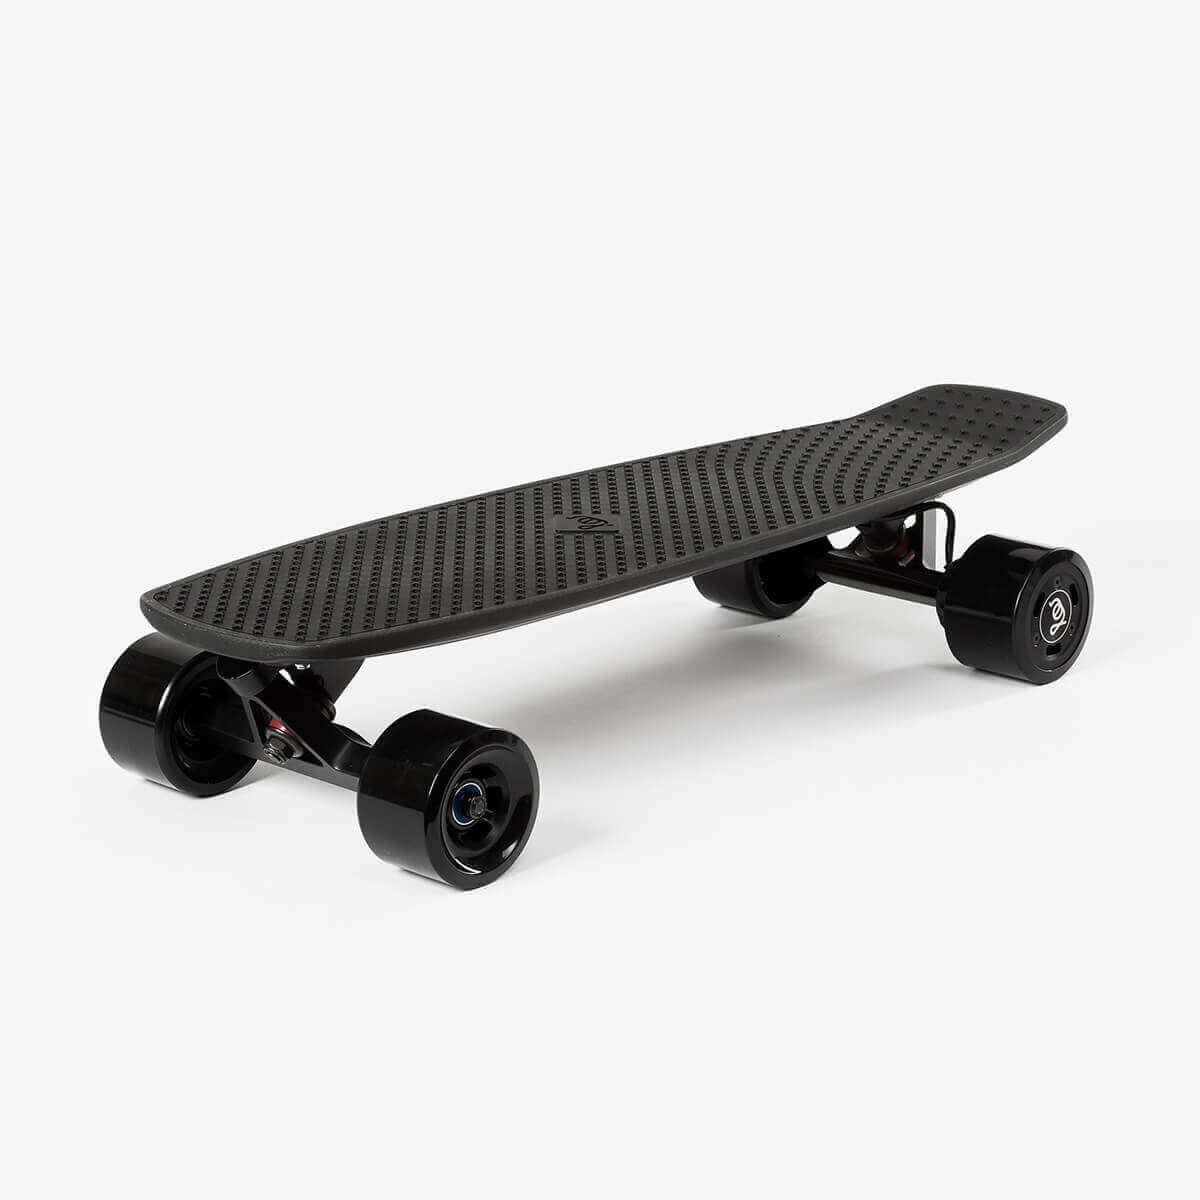 Cheap Electric Skateboard >> Lou 3 0 Electric Skateboard Most Powerful Lou Board